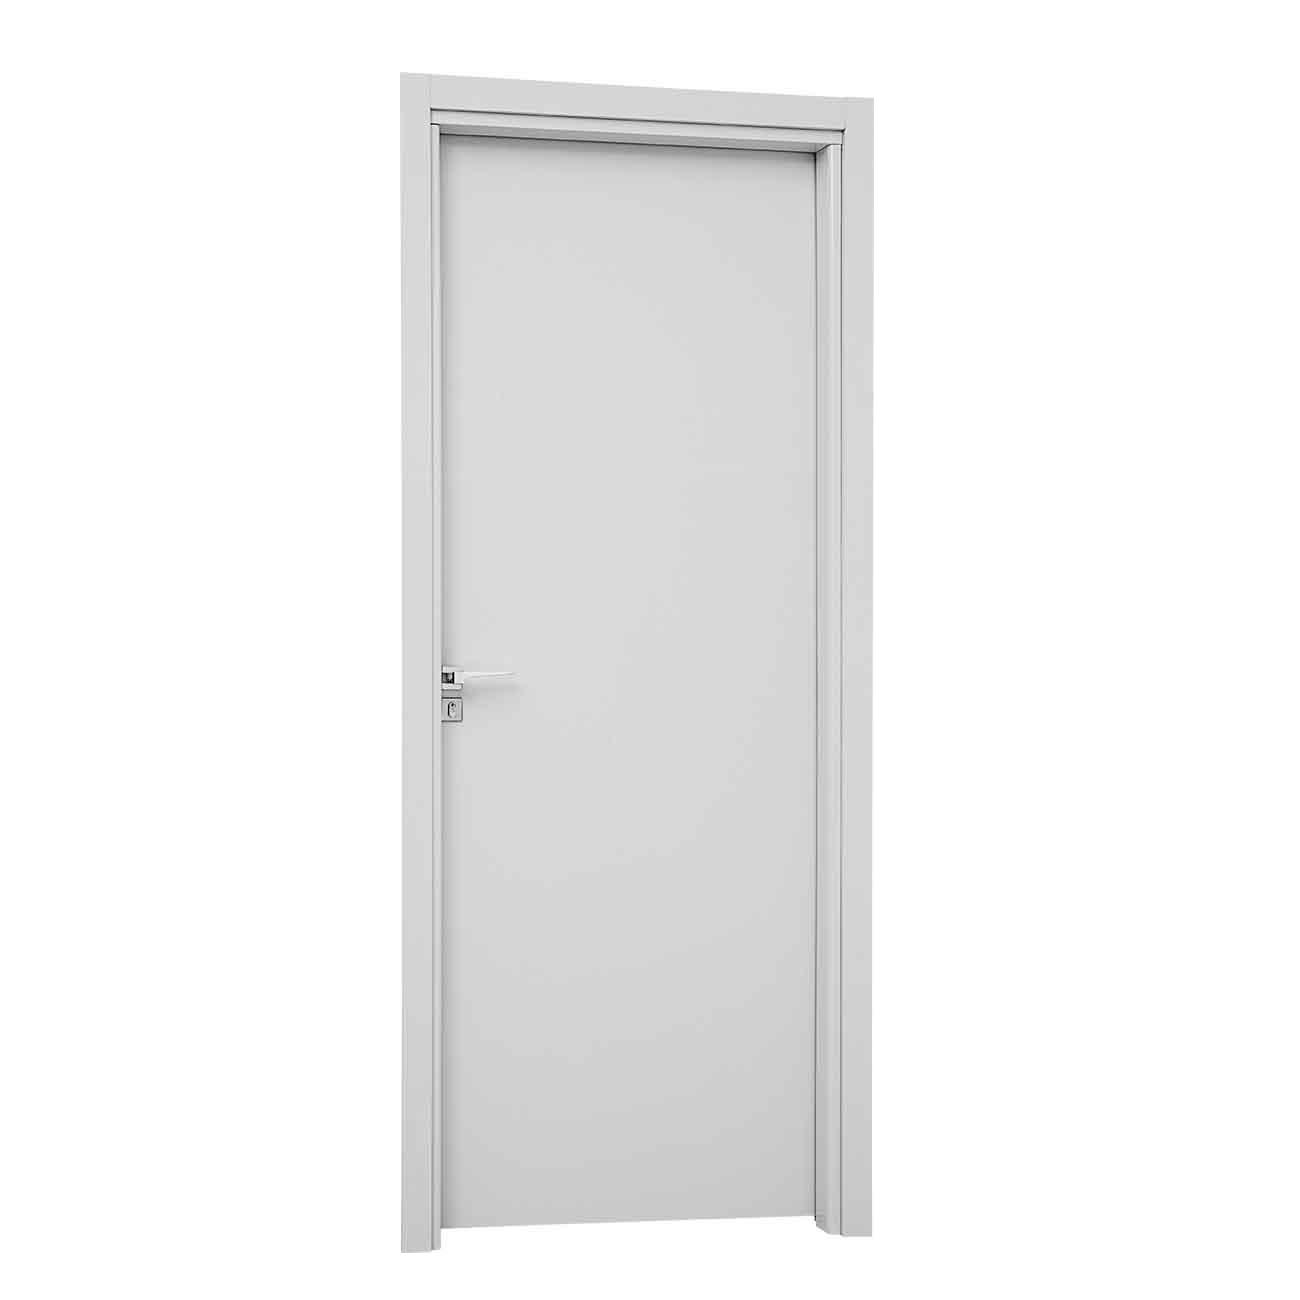 Porta Interna Esquerda Aluminium 215x86